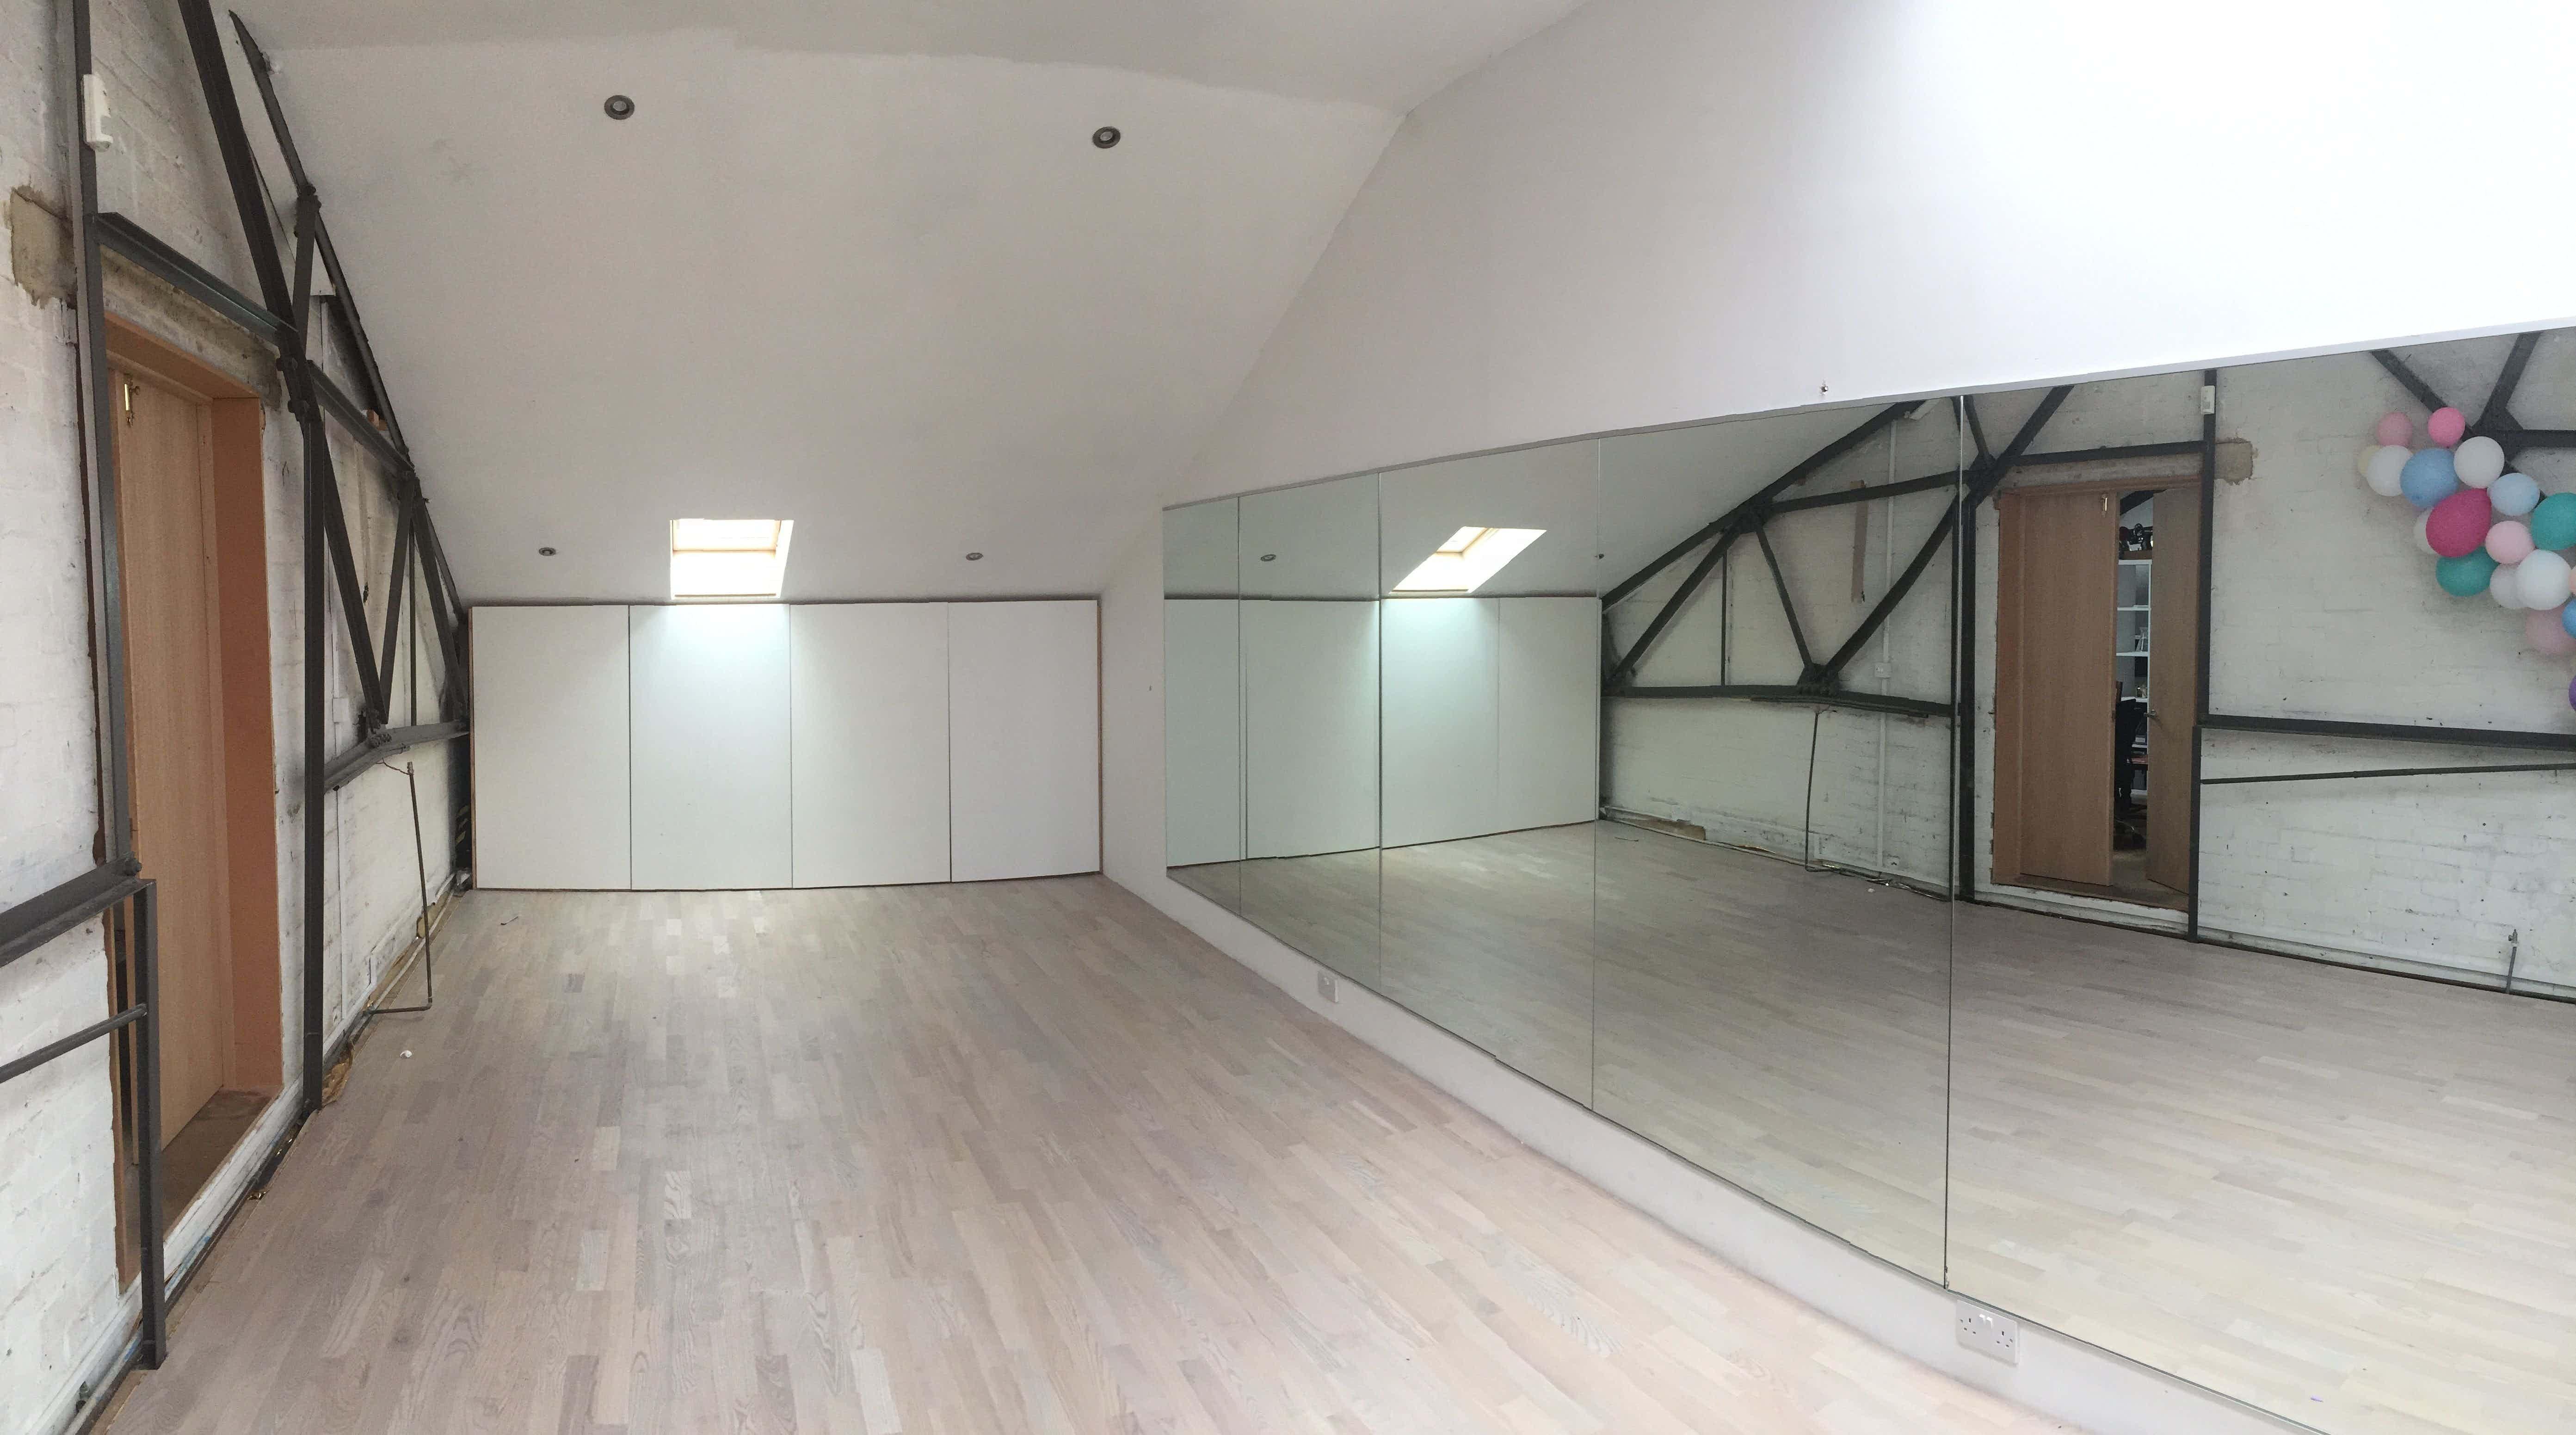 Dance and Photography Studio, Bustle